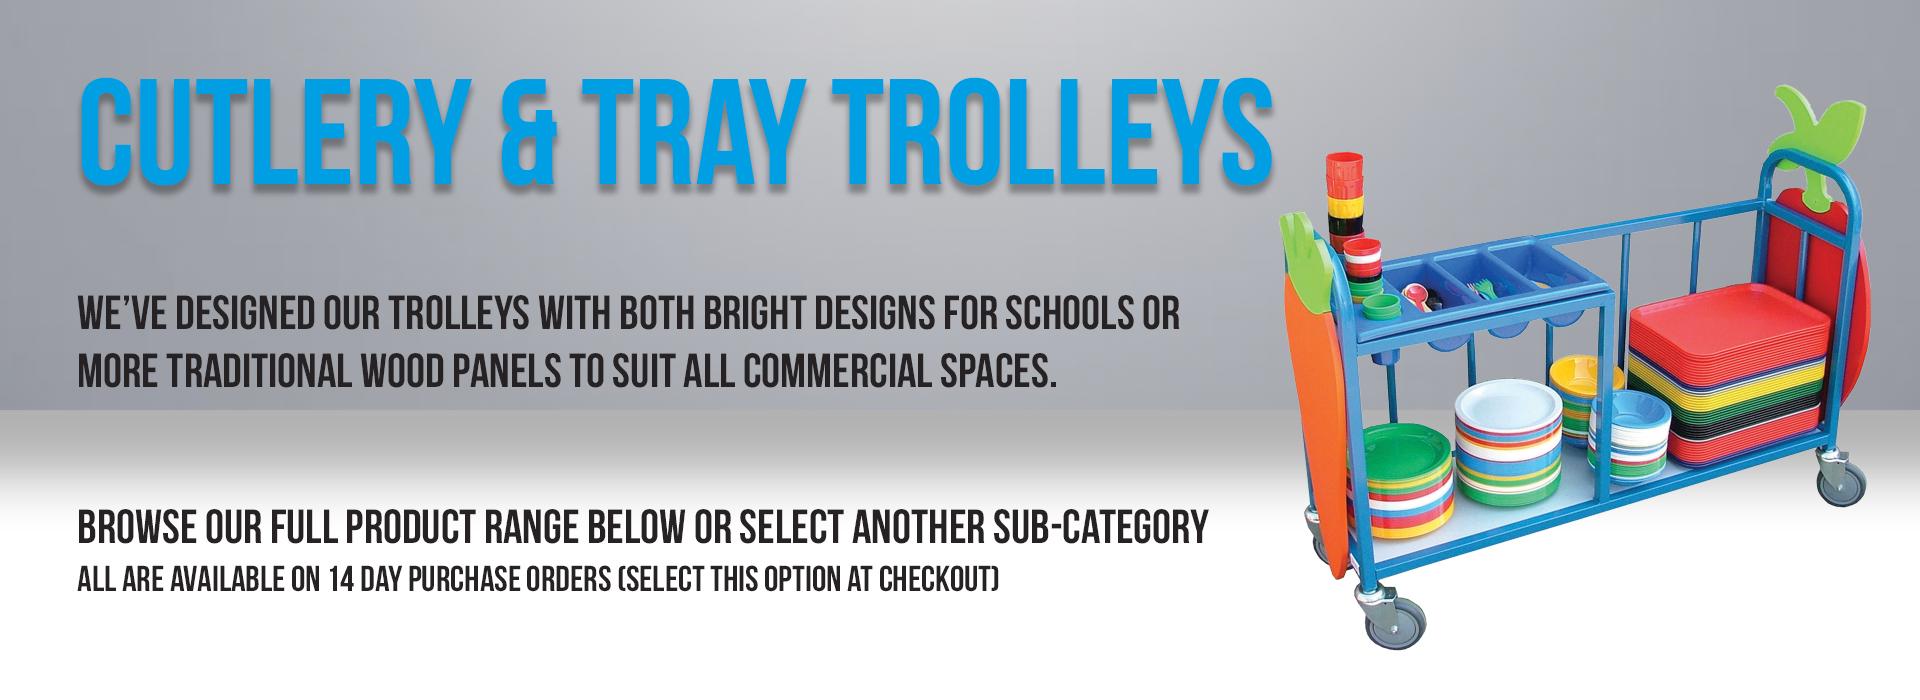 cutlery-and-tray-trolleys-banner.jpg